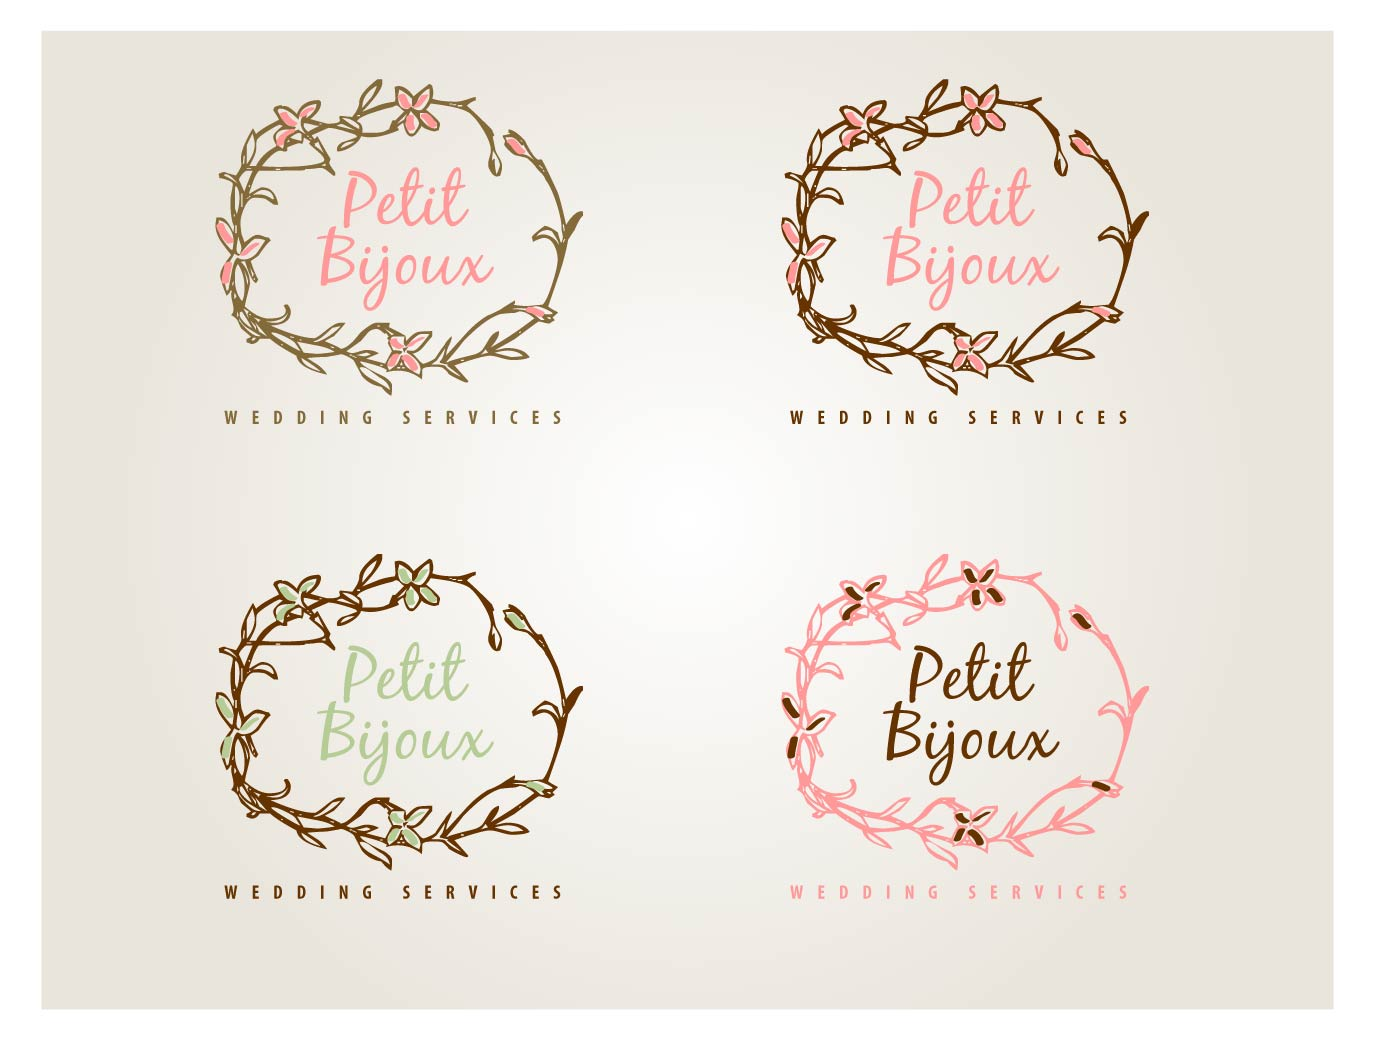 Elegant feminine wedding logo design for petit bijoux wedding elegant feminine wedding logo design for a company in united kingdom design 4527344 junglespirit Images